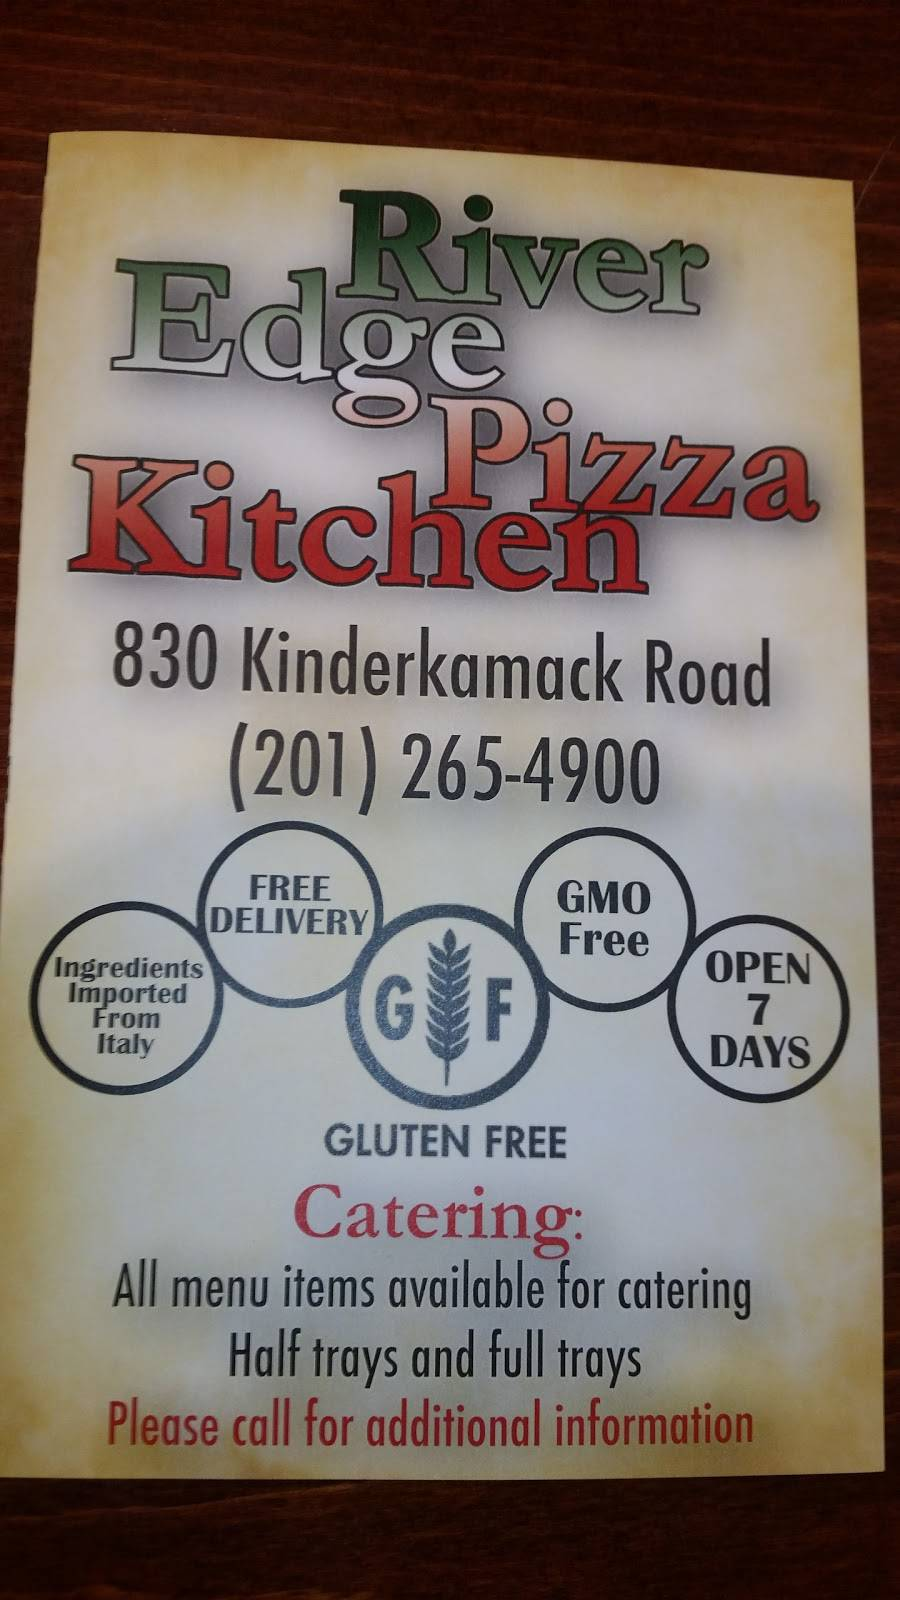 River Edge Pizza Kitchen   restaurant   830 Kinderkamack Rd, River Edge, NJ 07661, USA   2012654900 OR +1 201-265-4900